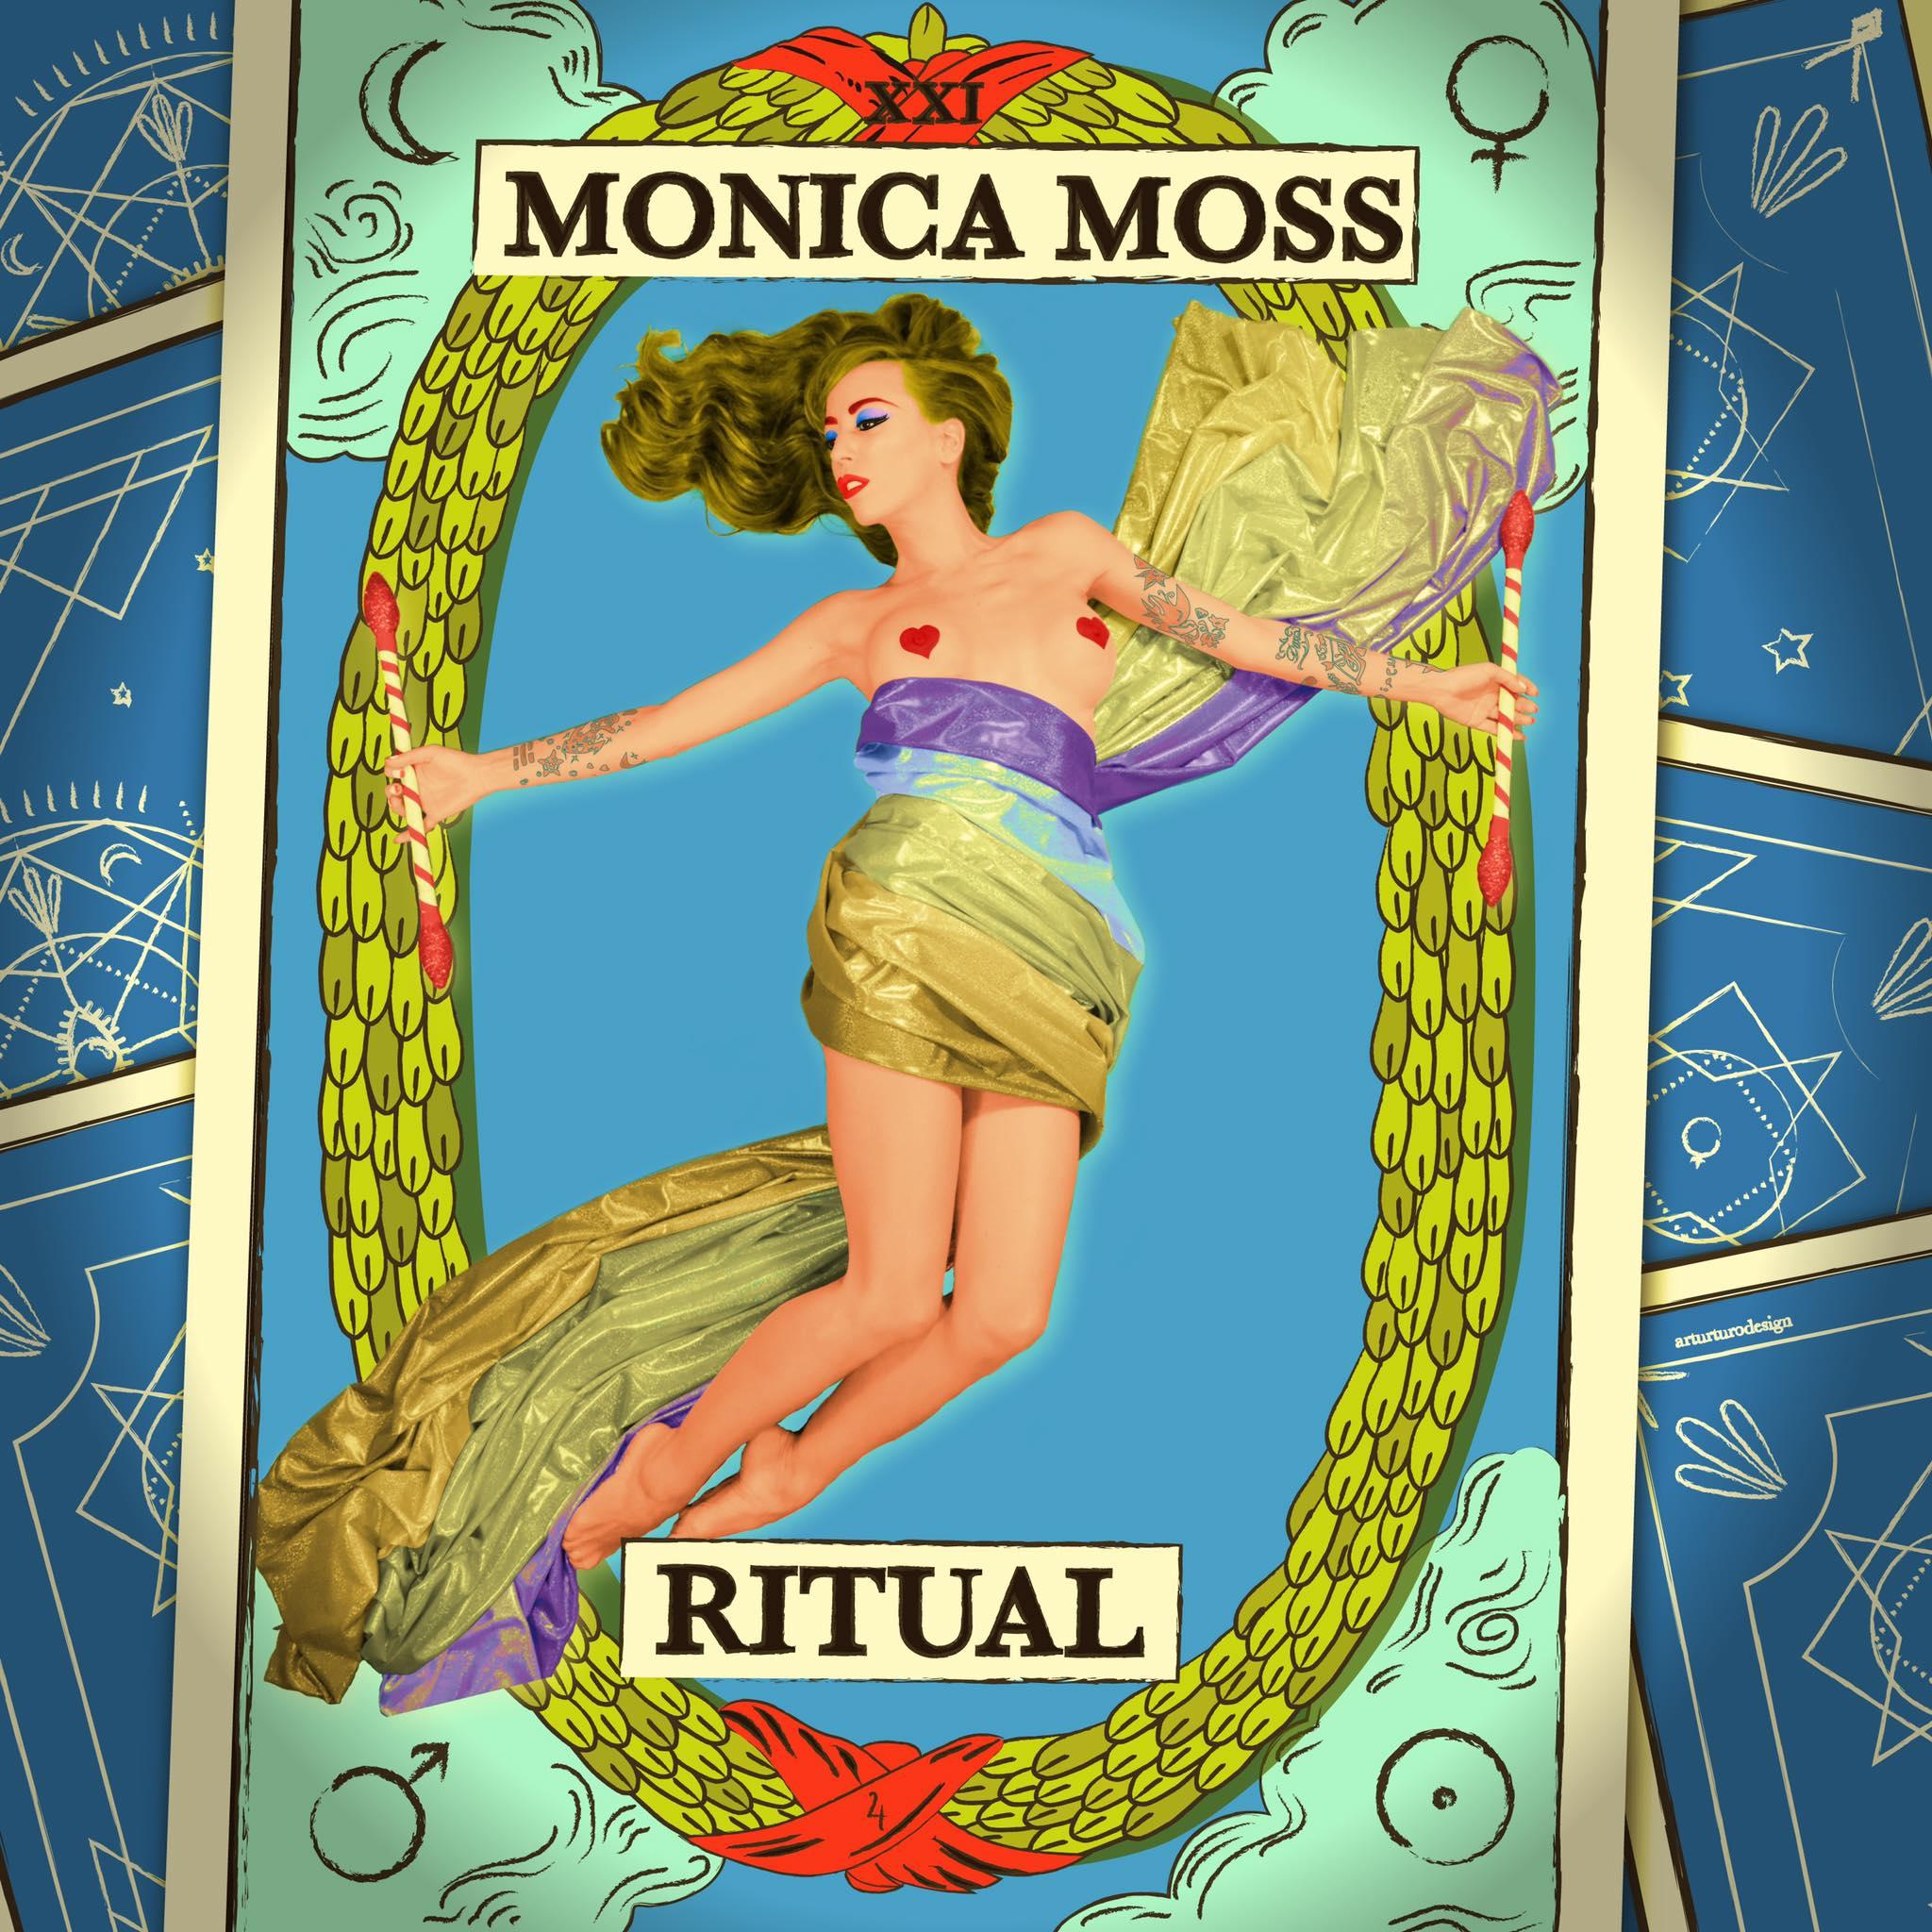 Ritual MonicaMoss Portada